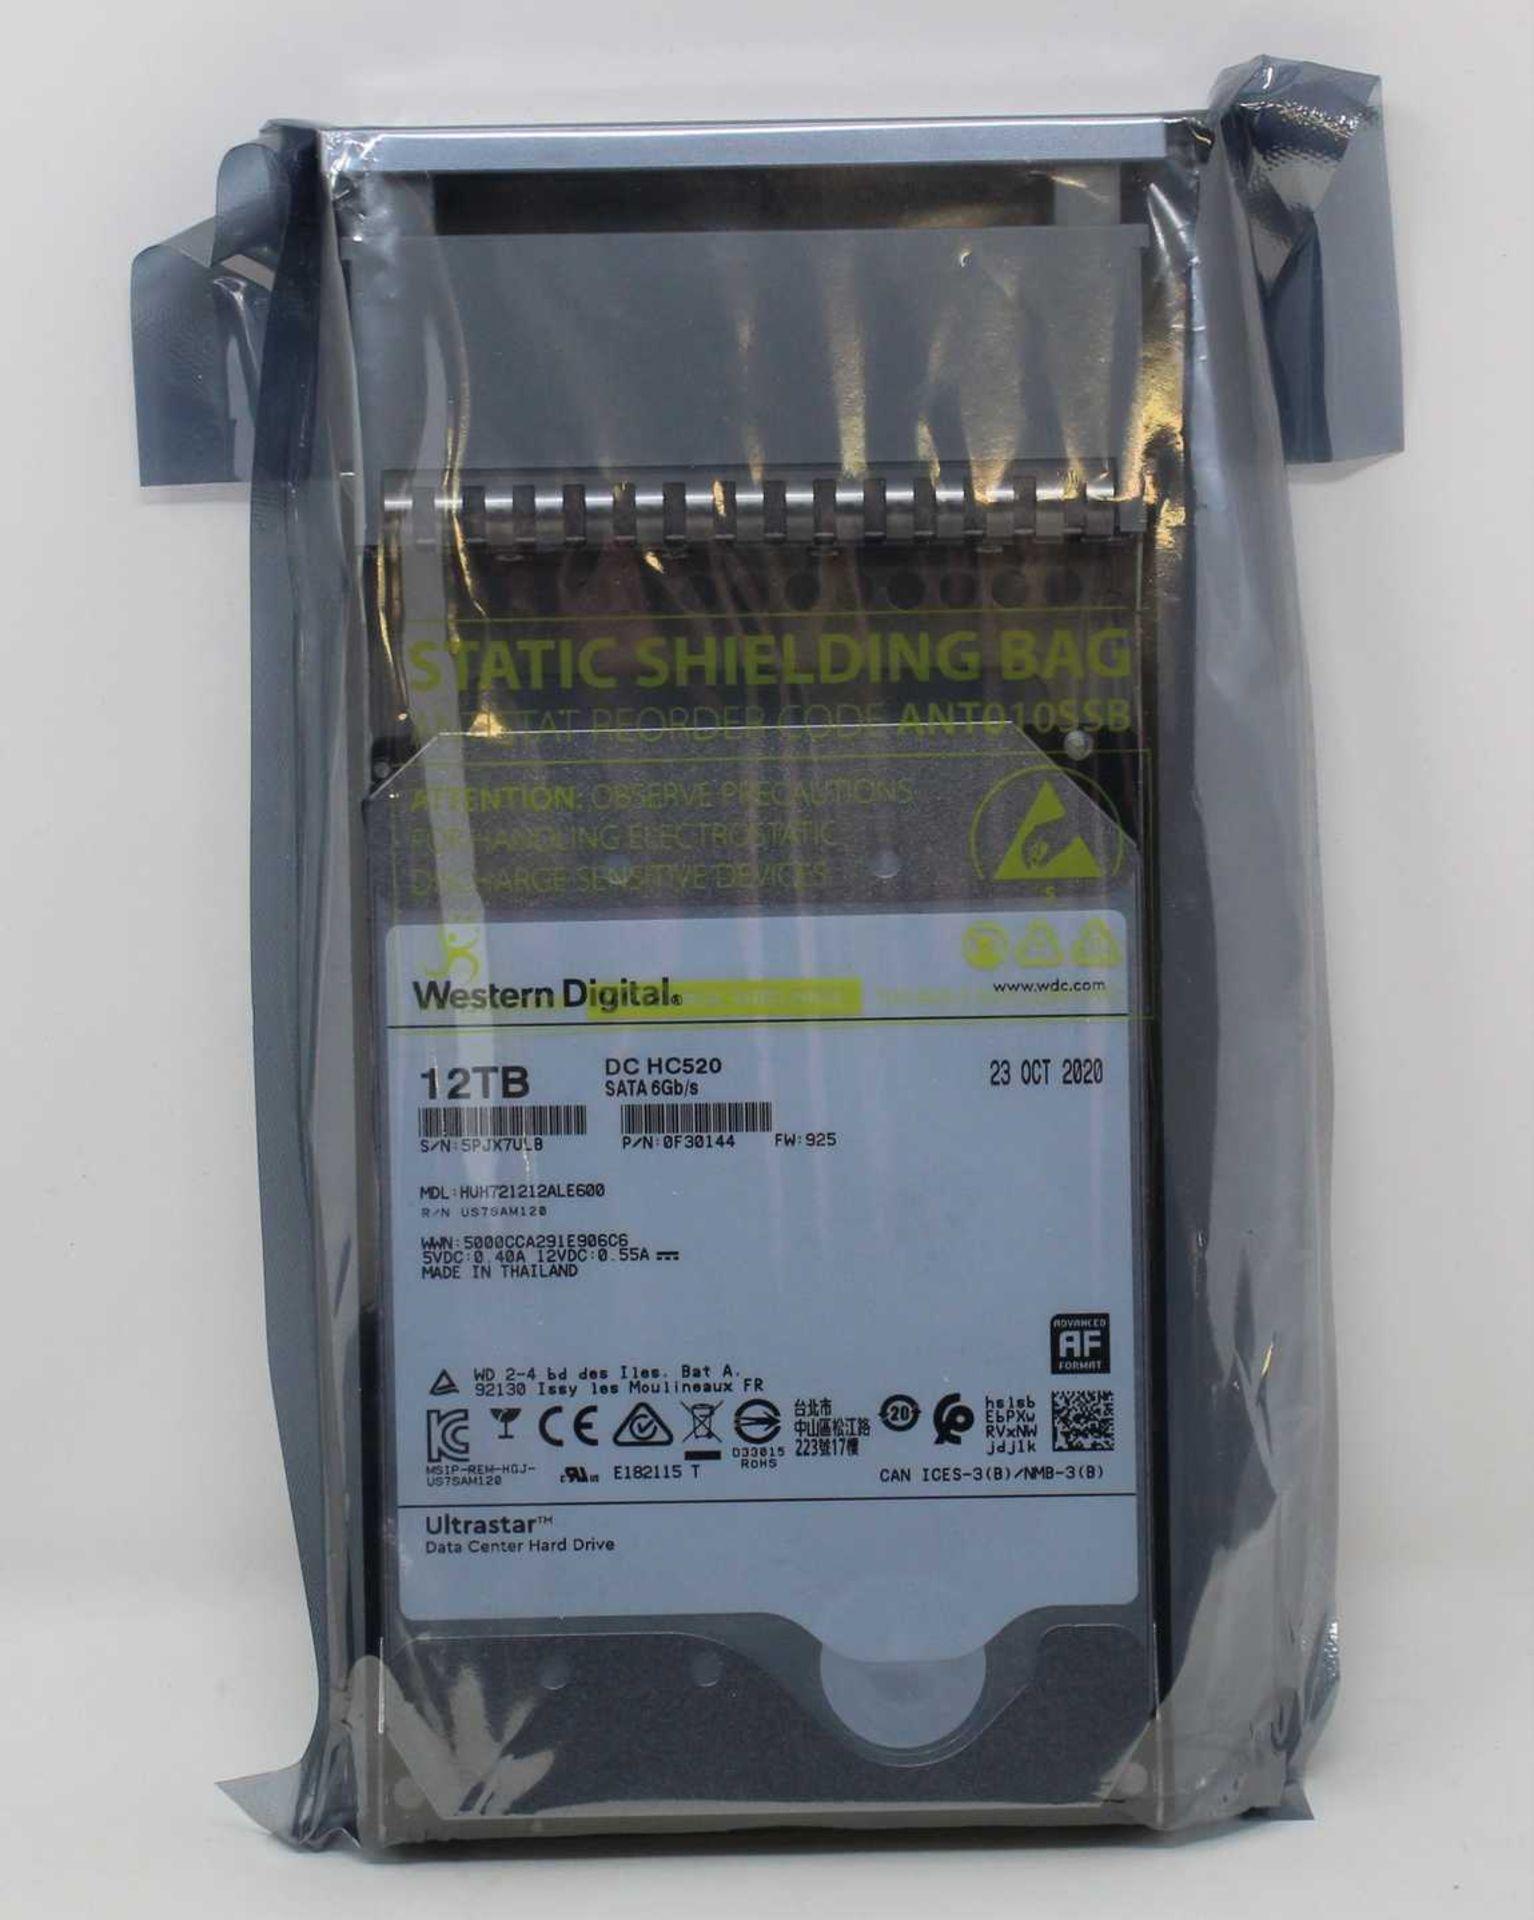 A boxed as new WD Ultrastar DC HC520 HDD 12TB 7.2K SATA 6Gb/s 256MB Data Center Internal Hard Disk